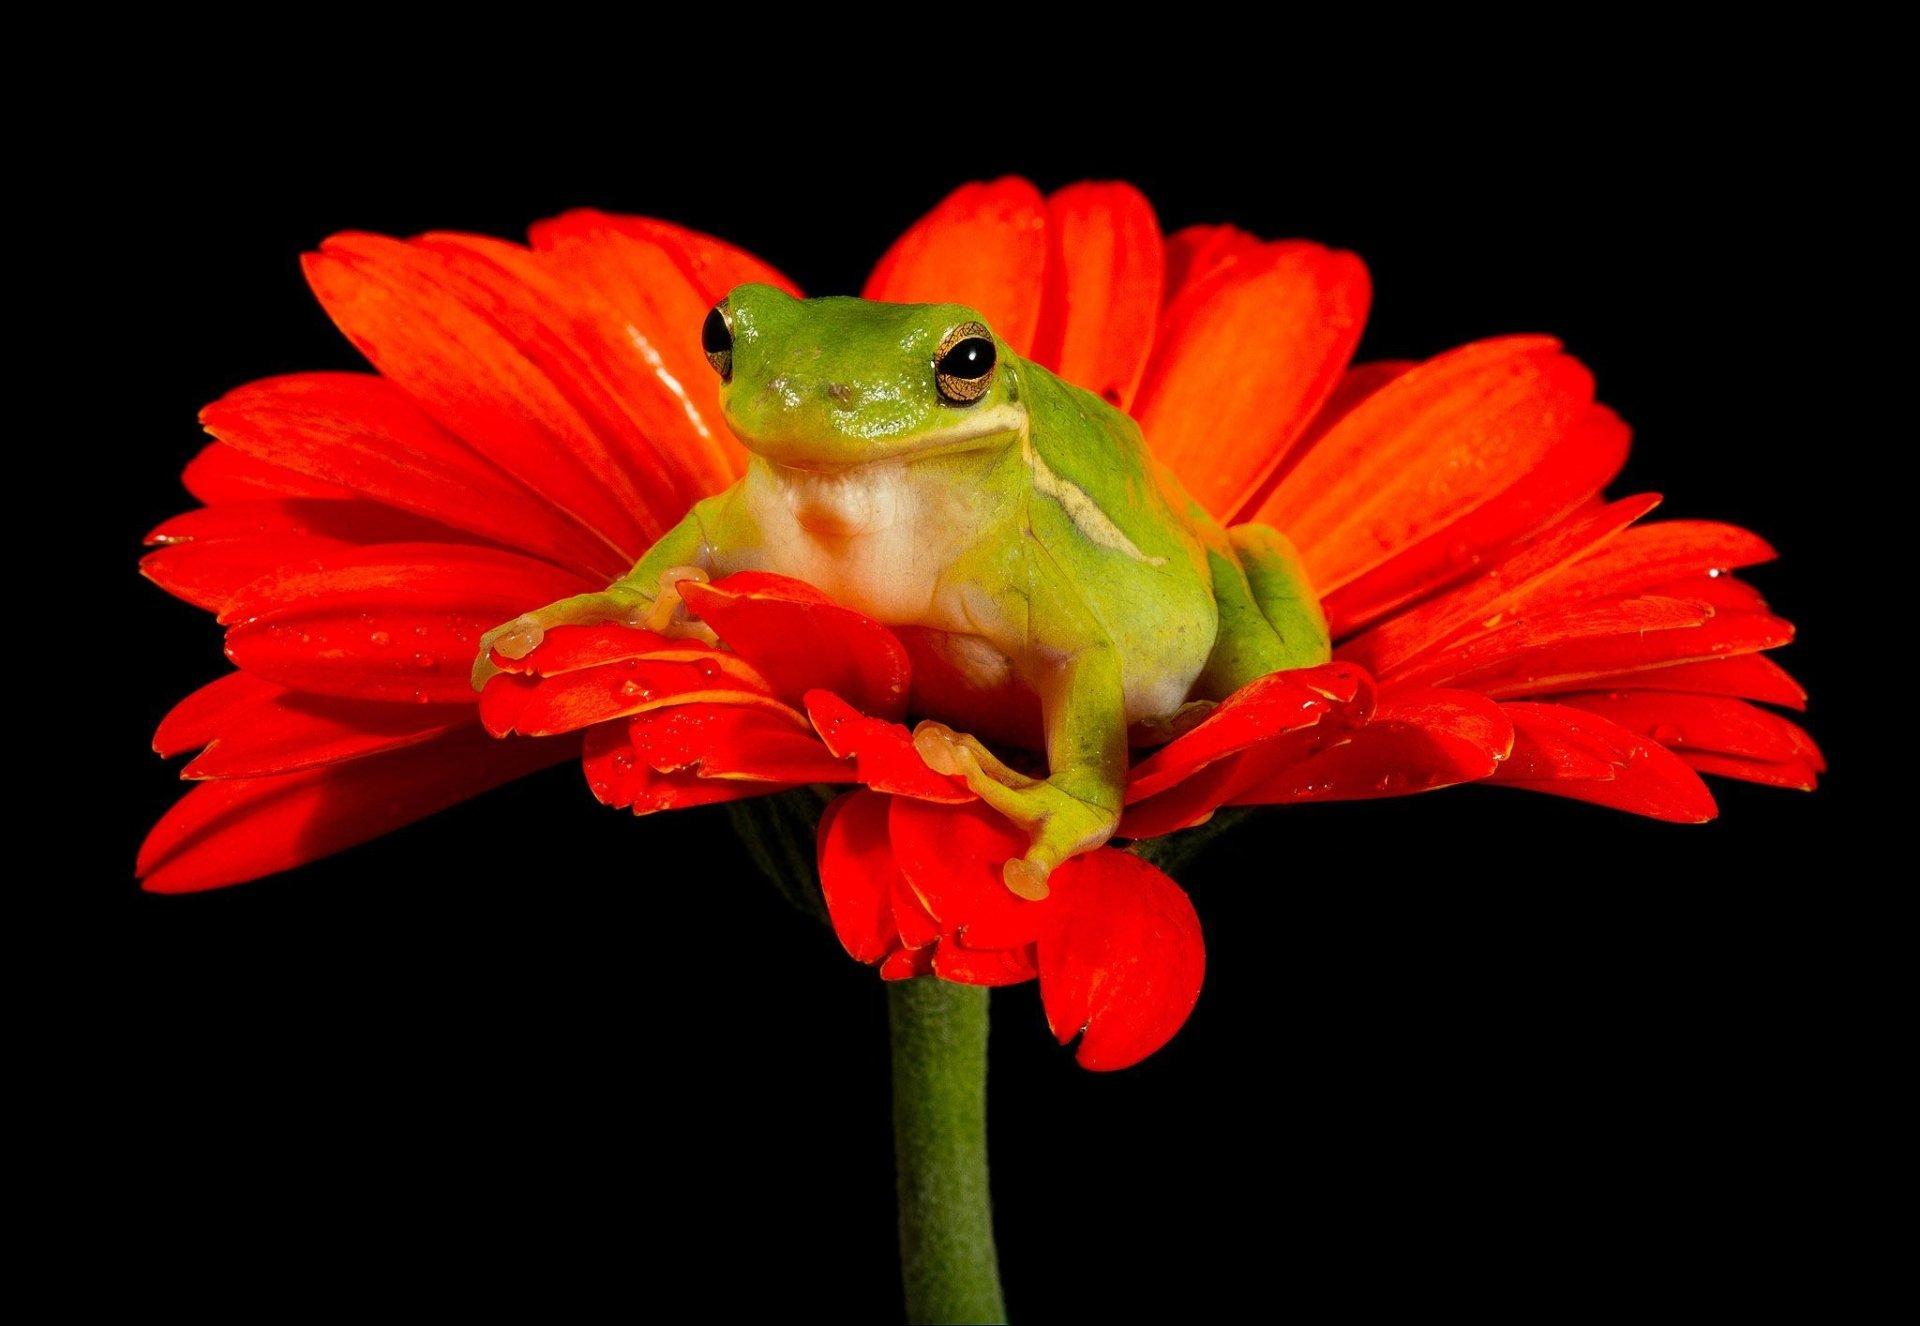 Animal - Tree Frog  Animal Frog Flower Gerbera Orange Flower Amphibian Wallpaper